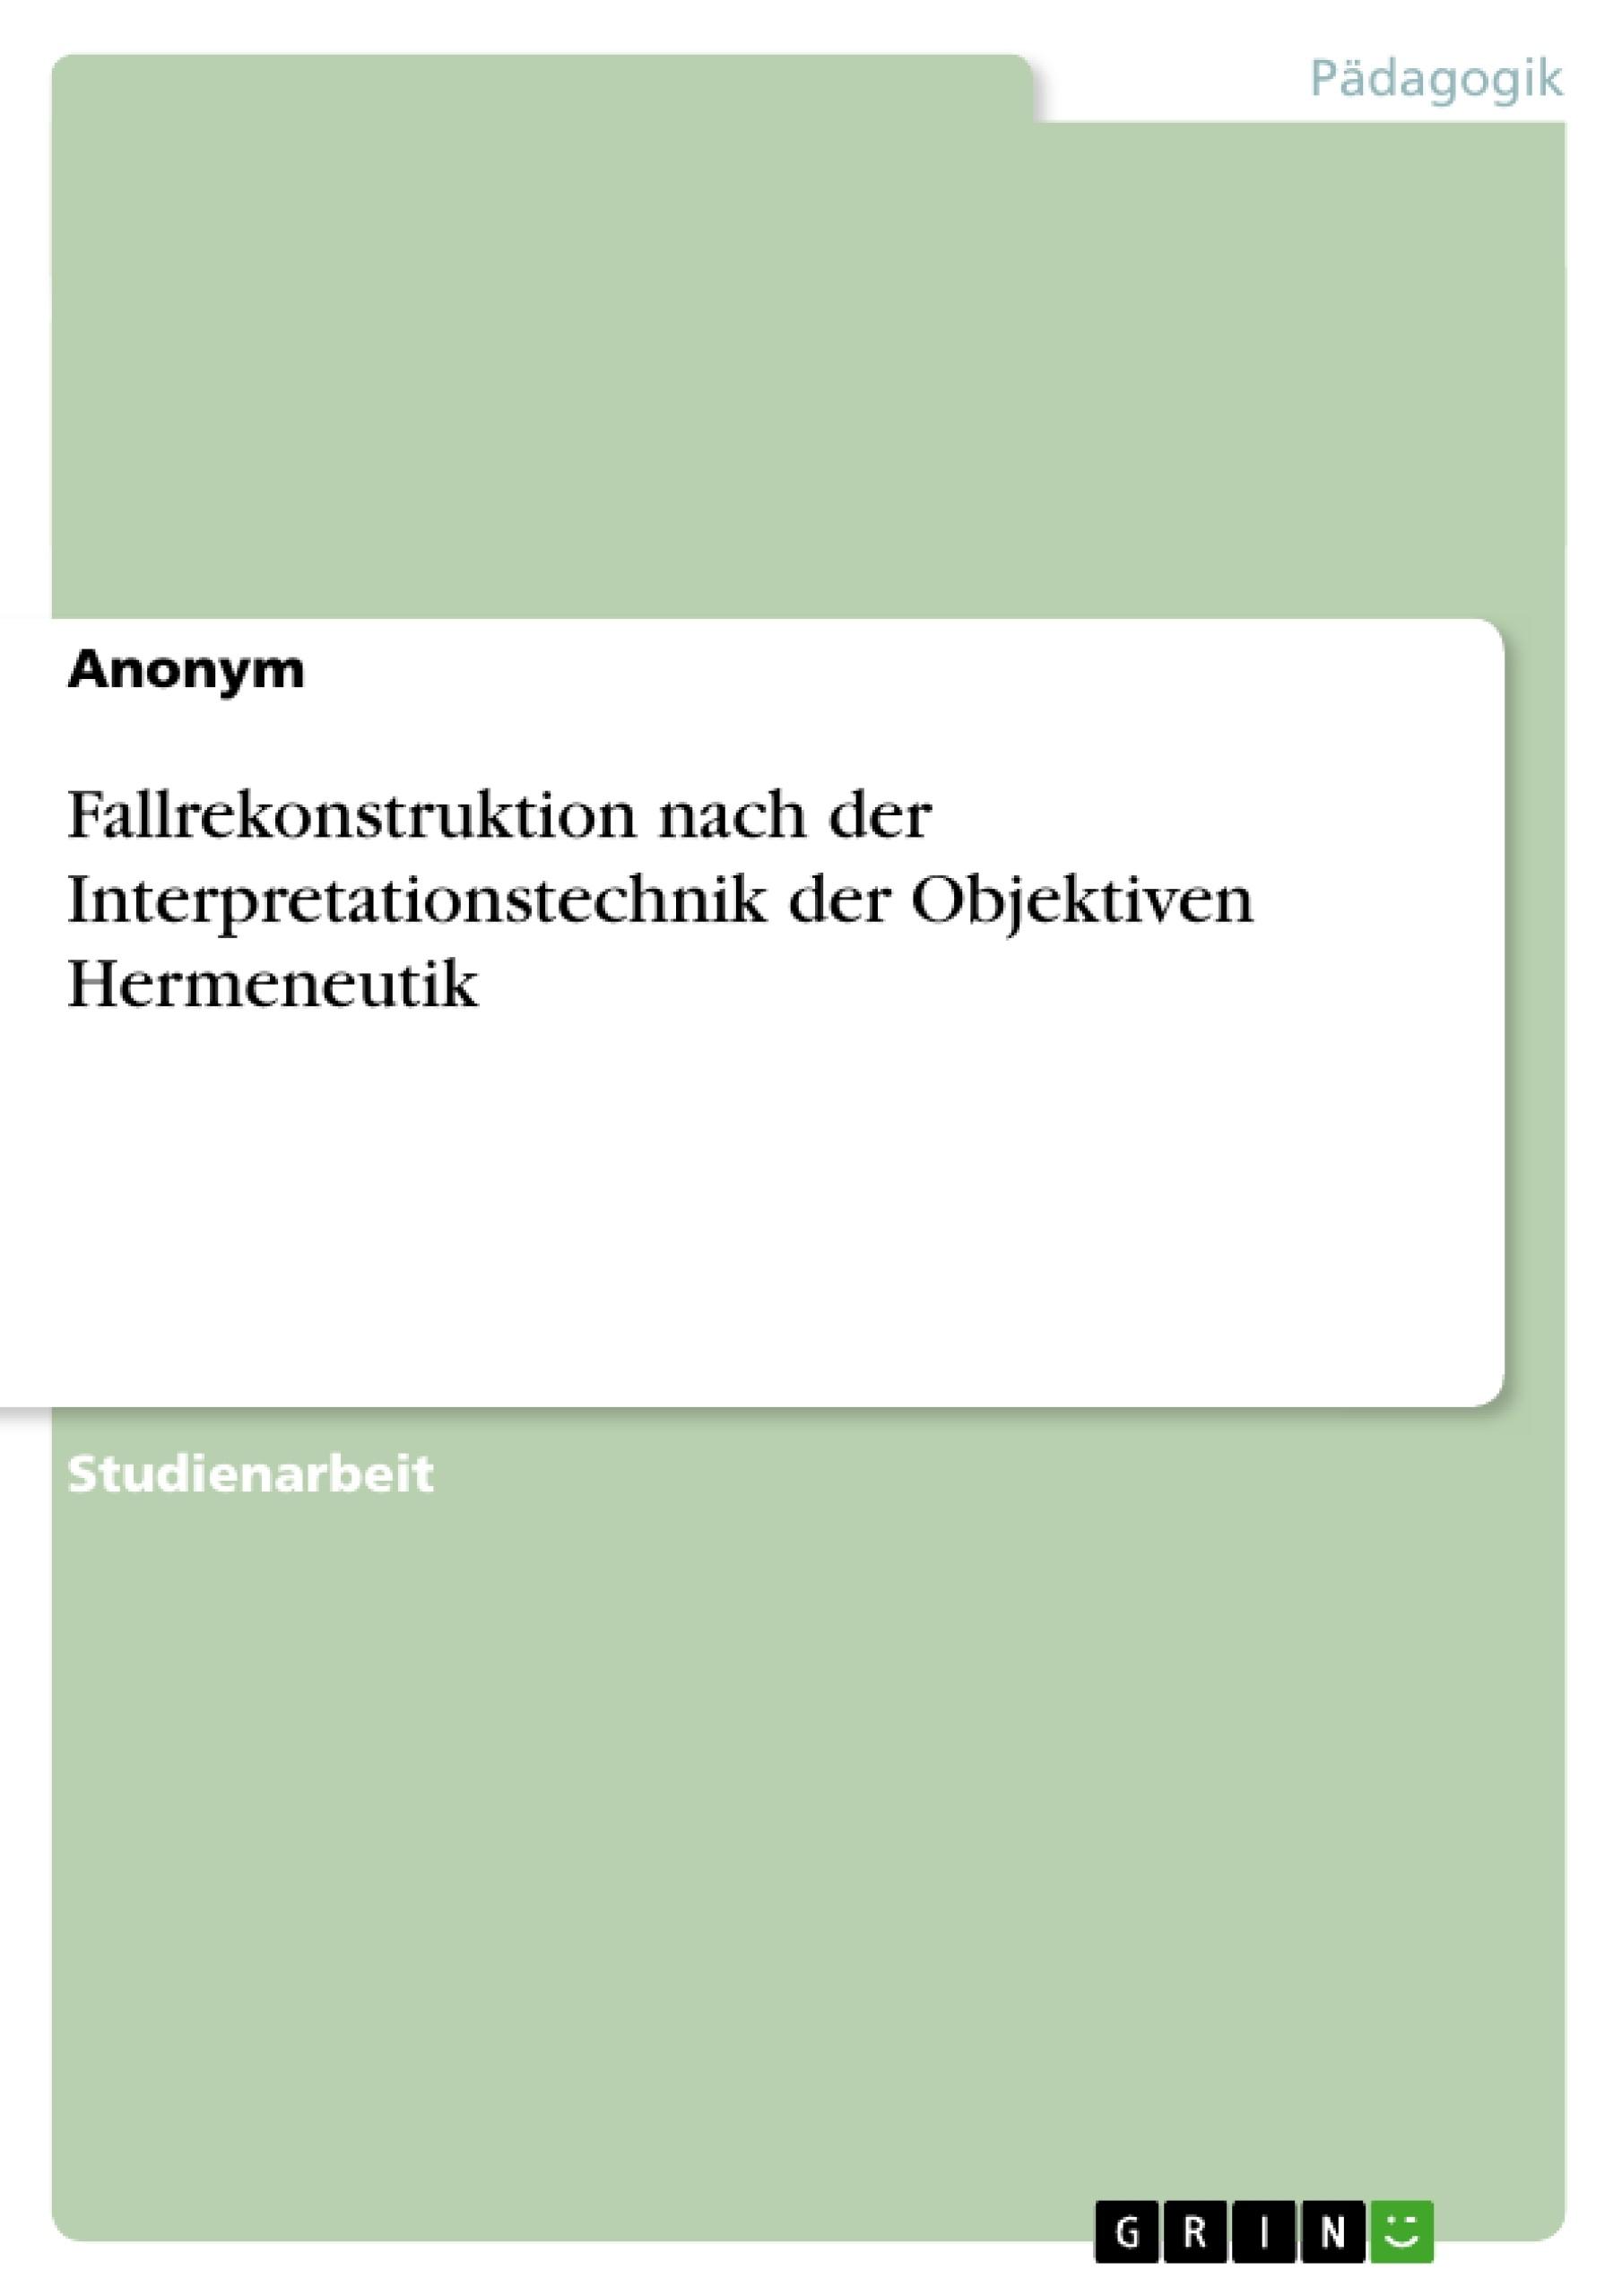 Titel: Fallrekonstruktion nach der Interpretationstechnik der Objektiven Hermeneutik